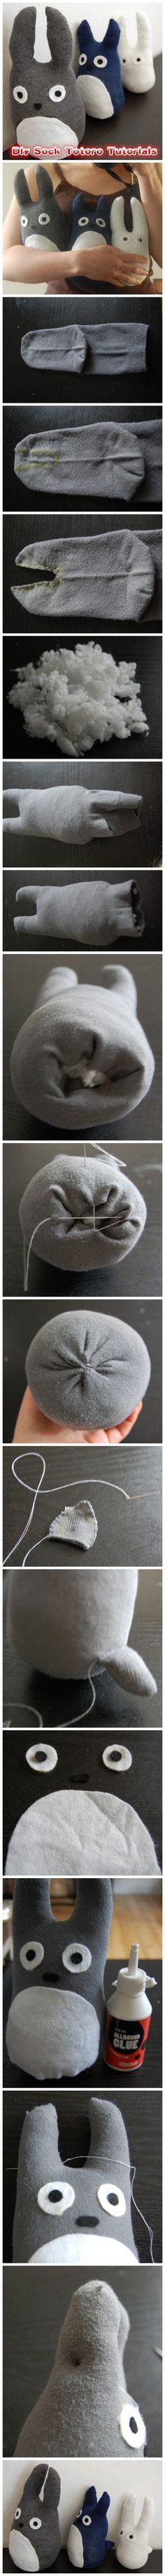 tutoriel chaussettes totoro